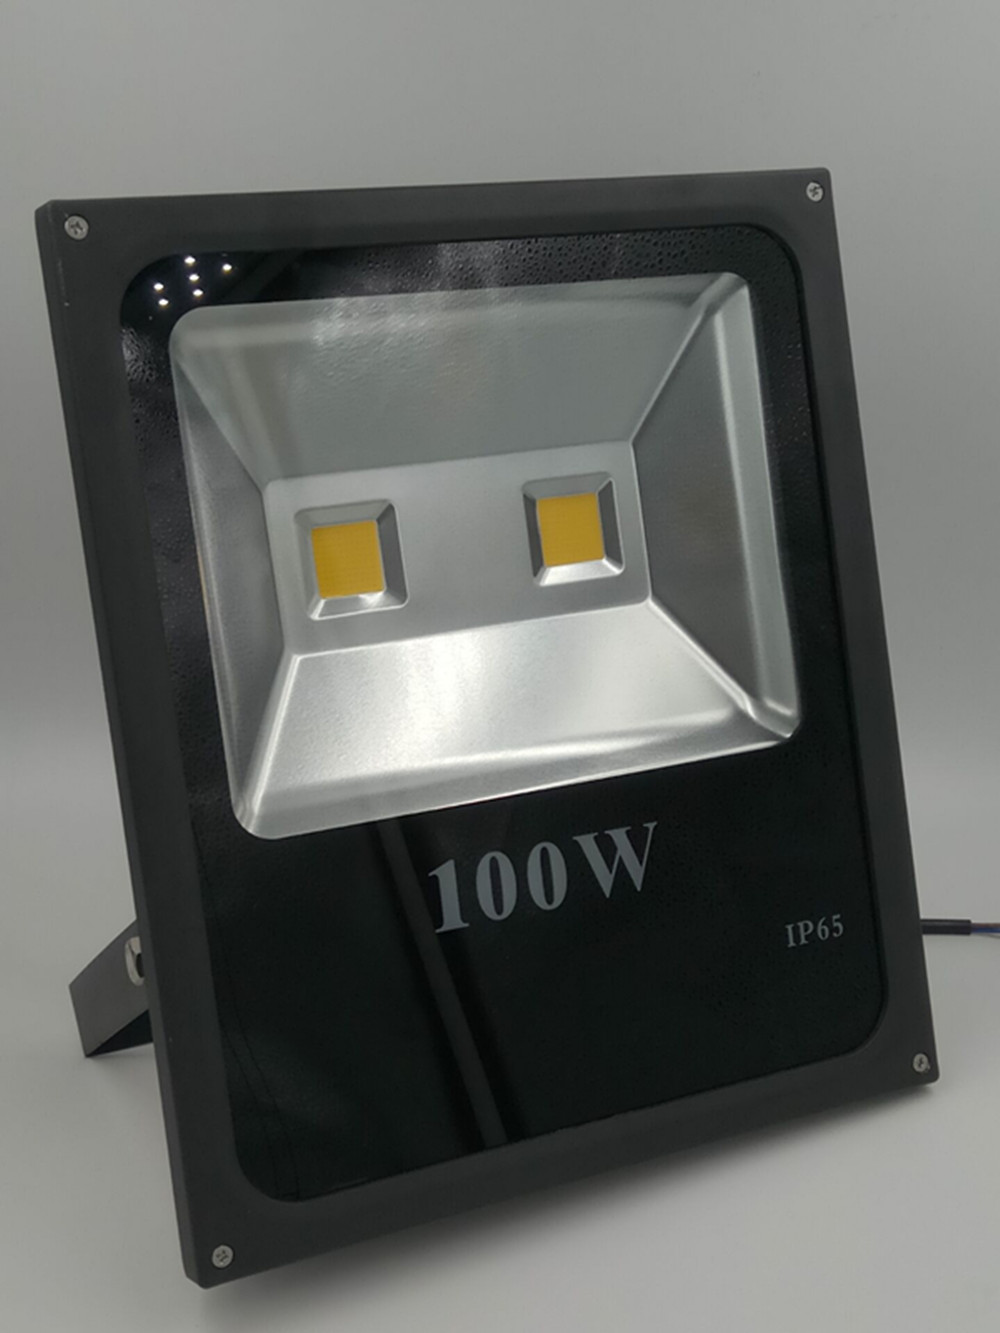 Today's Deal! LED FloodLight 100W Led Flood Light 220V 110V Spotlight Waterproof Outdoor street Lamp ultrathin led flood light 200w ac85 265v waterproof ip65 floodlight spotlight outdoor lighting free shipping